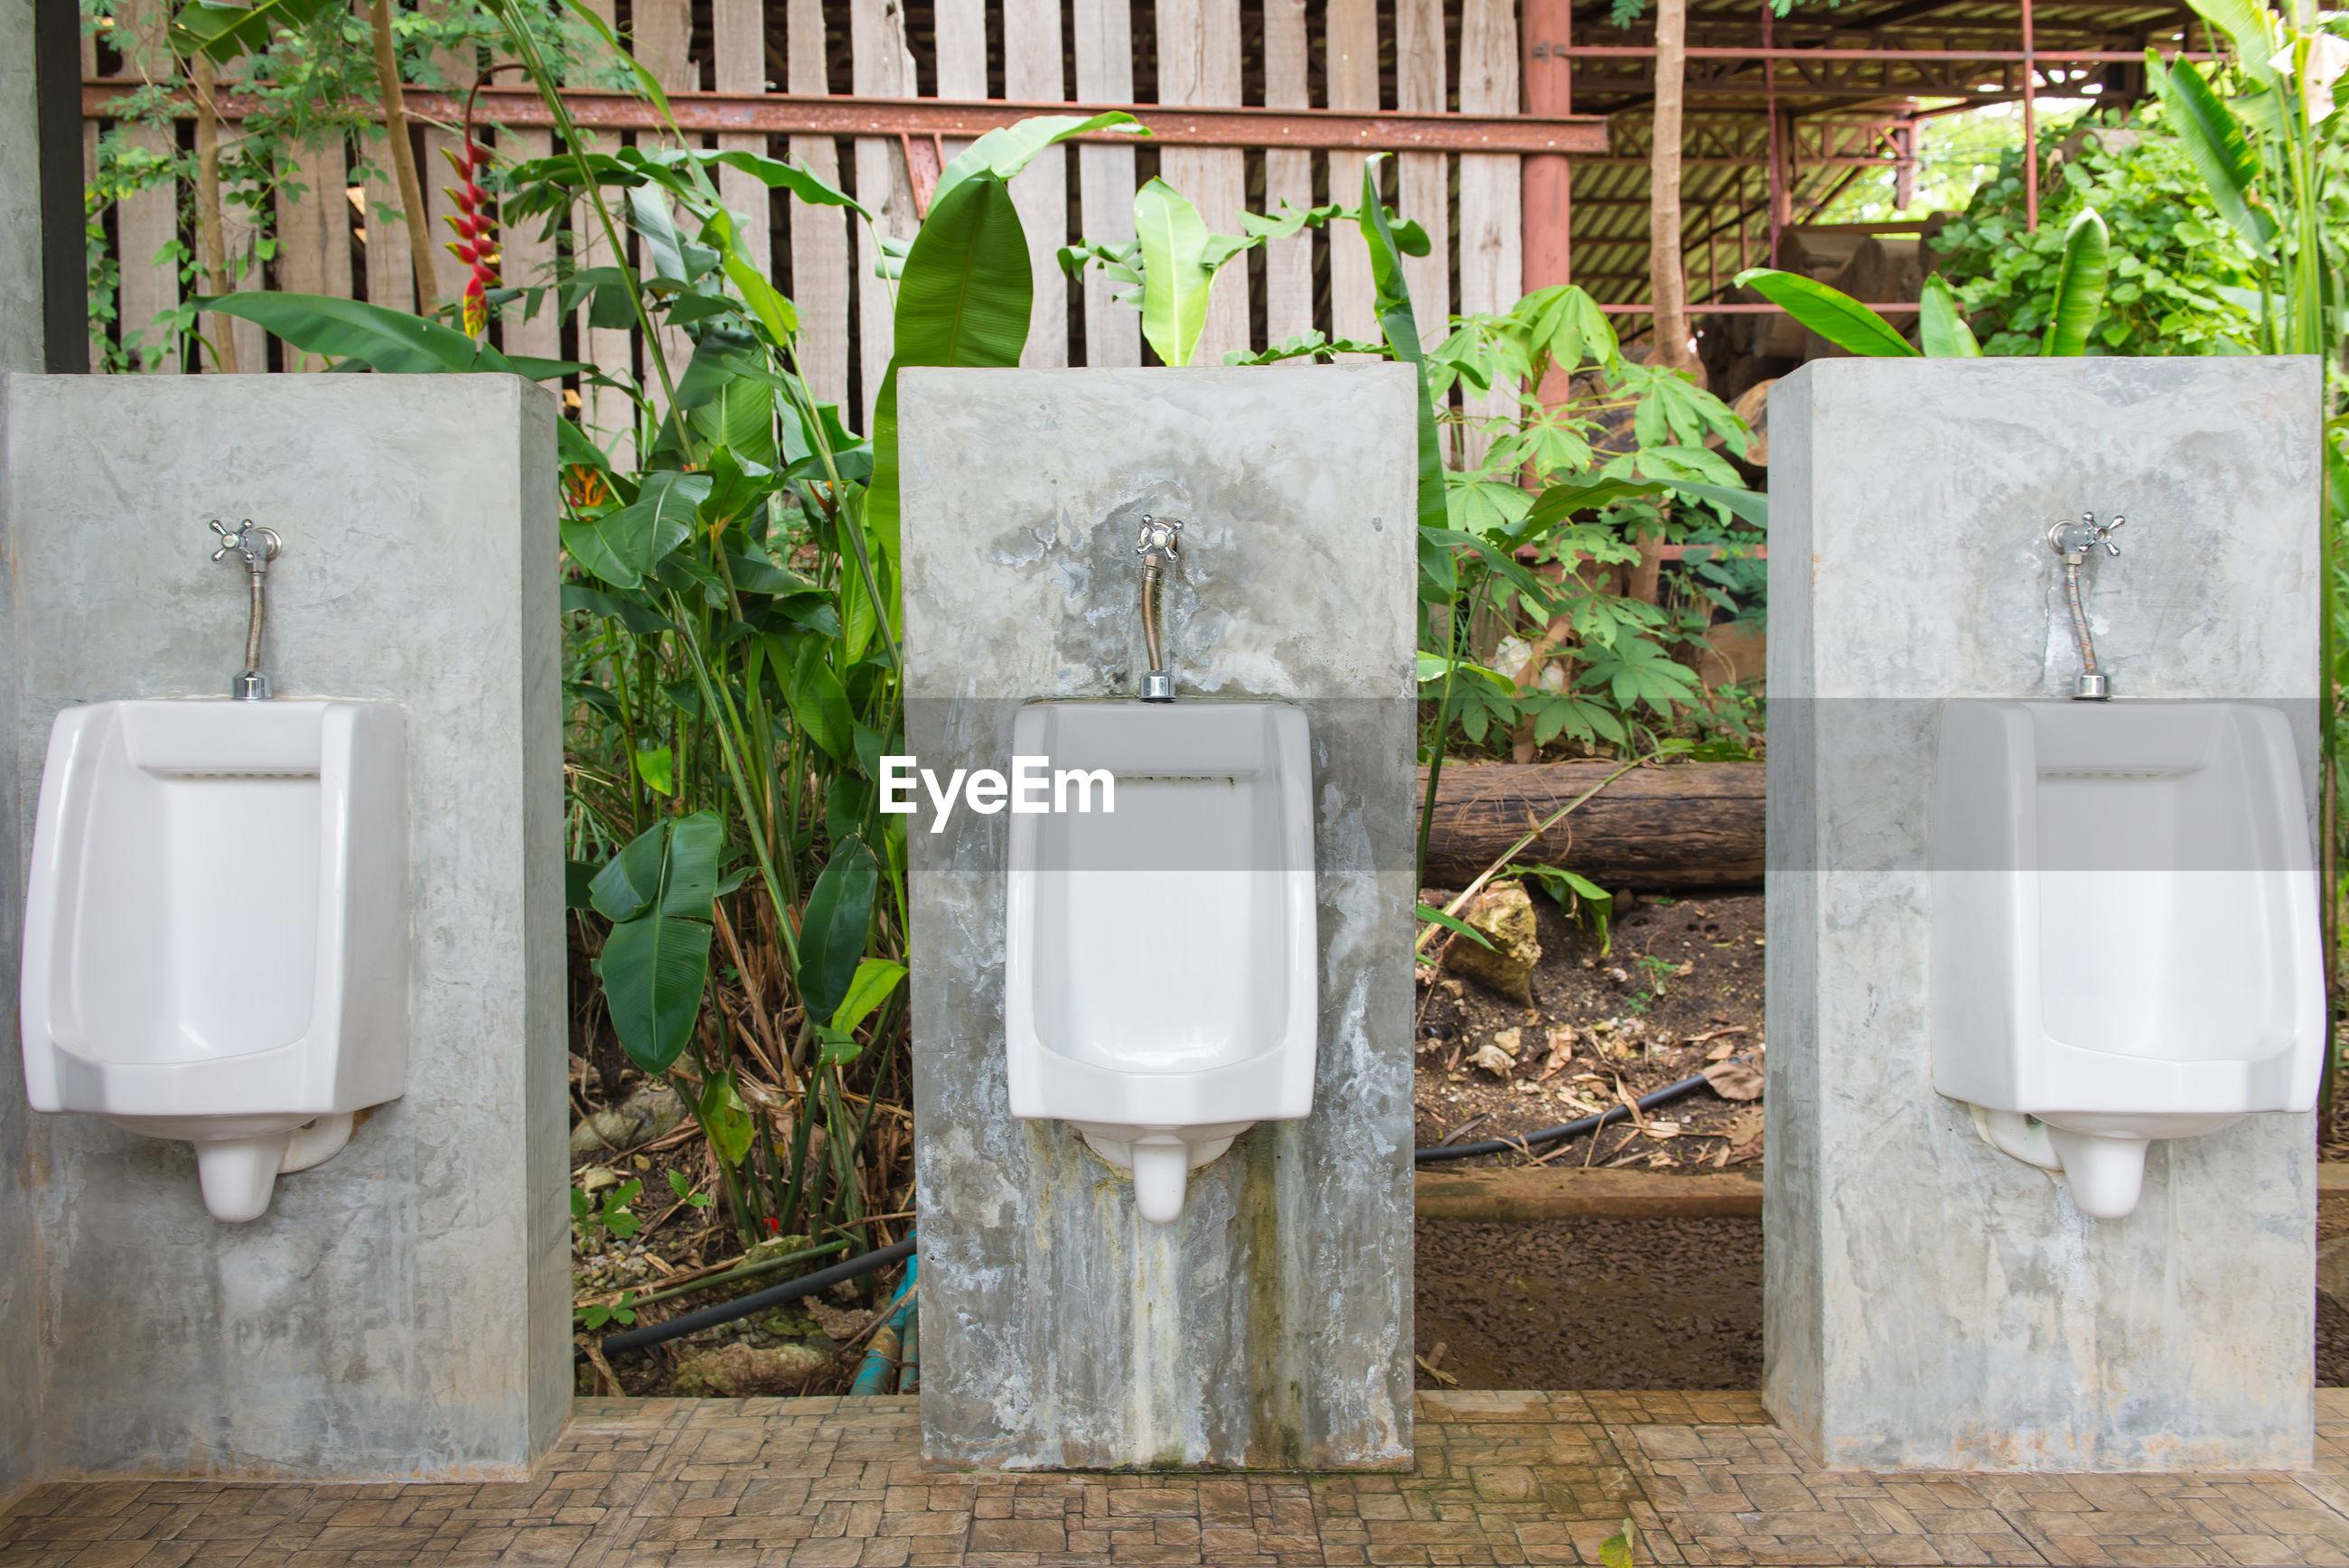 Urinals on concrete blocks outdoors